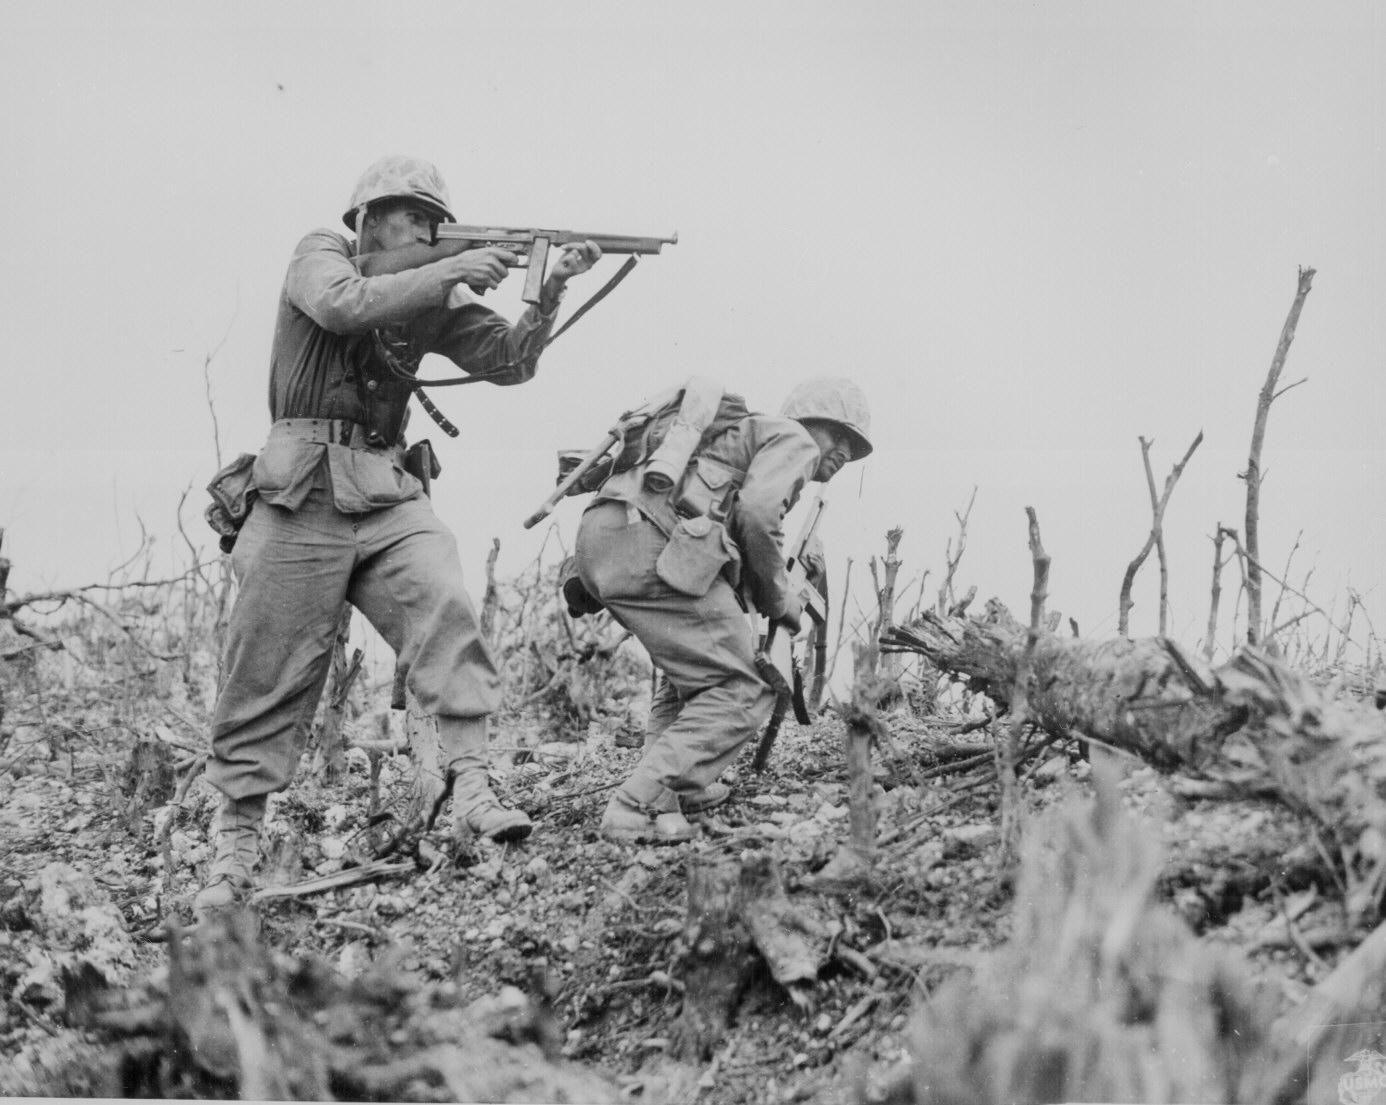 la bataille d'Iwo jima Ww2-158